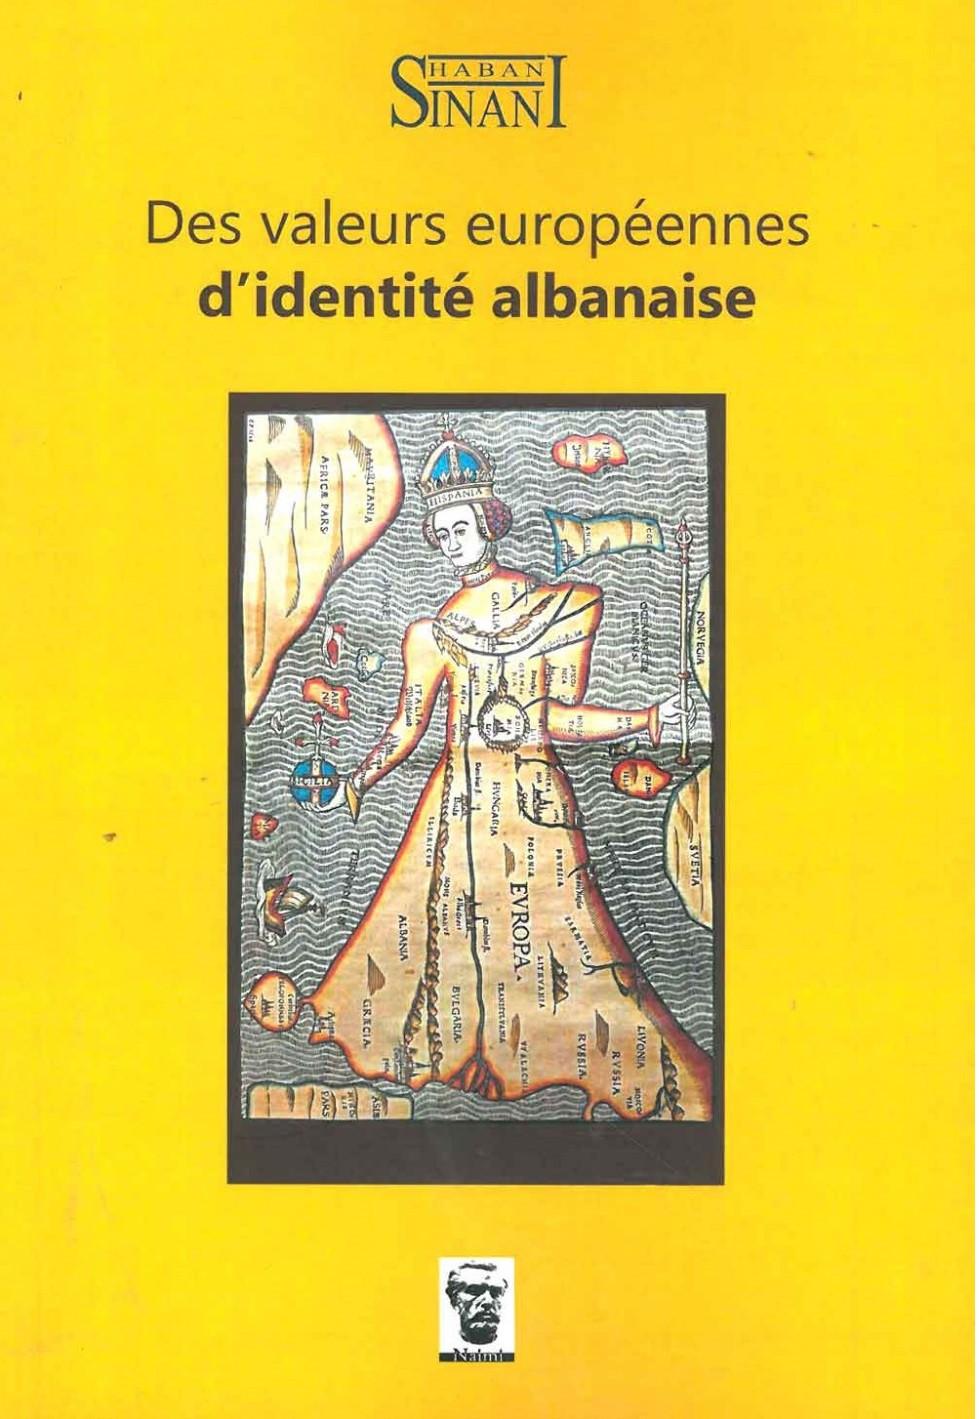 Des Valeurs Europeennes D'identite Albanaise